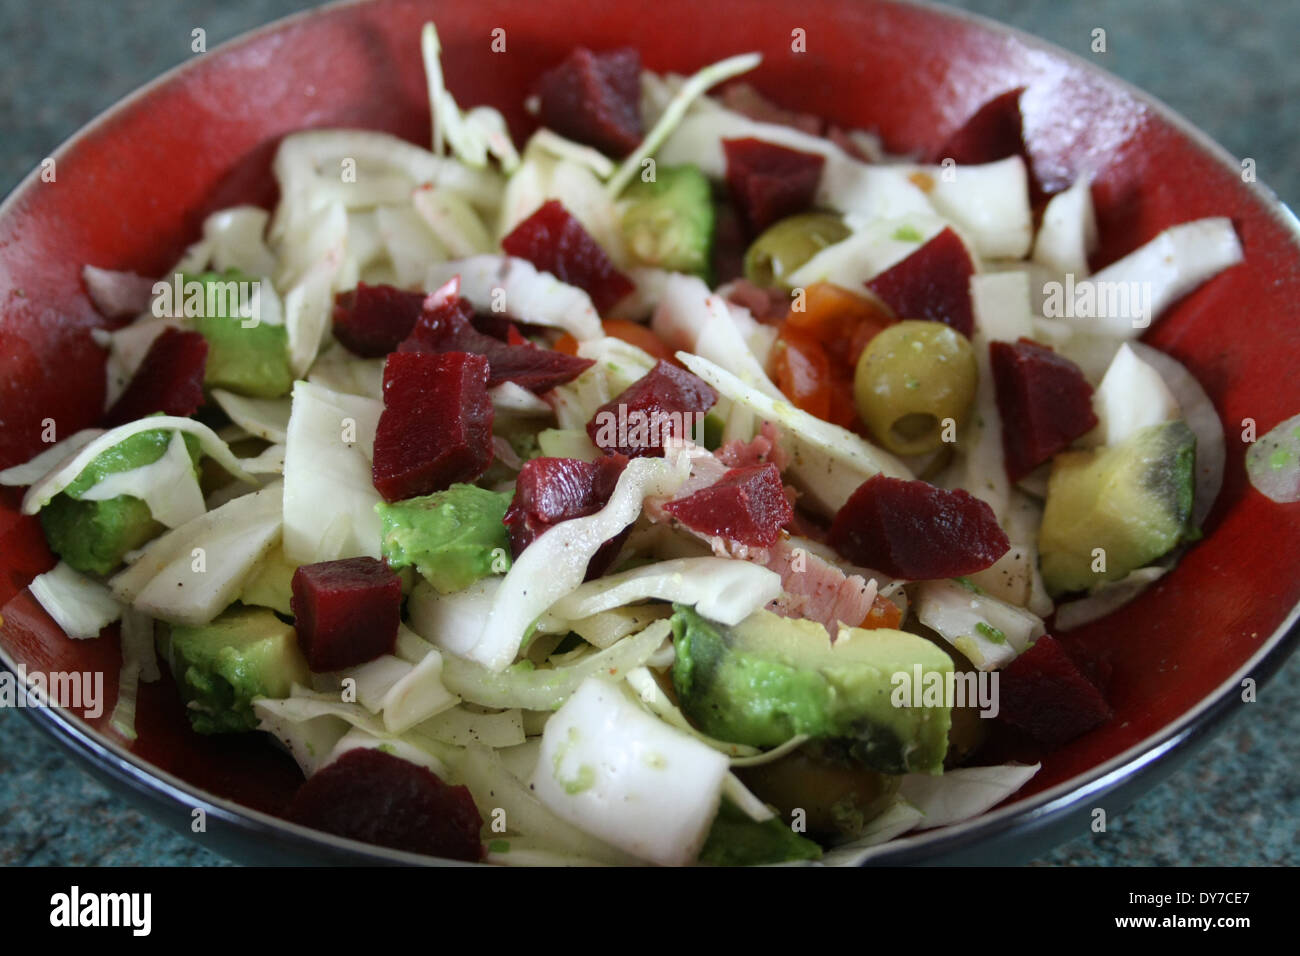 Slimming Salad, ensalada adelgazante - Stock Image